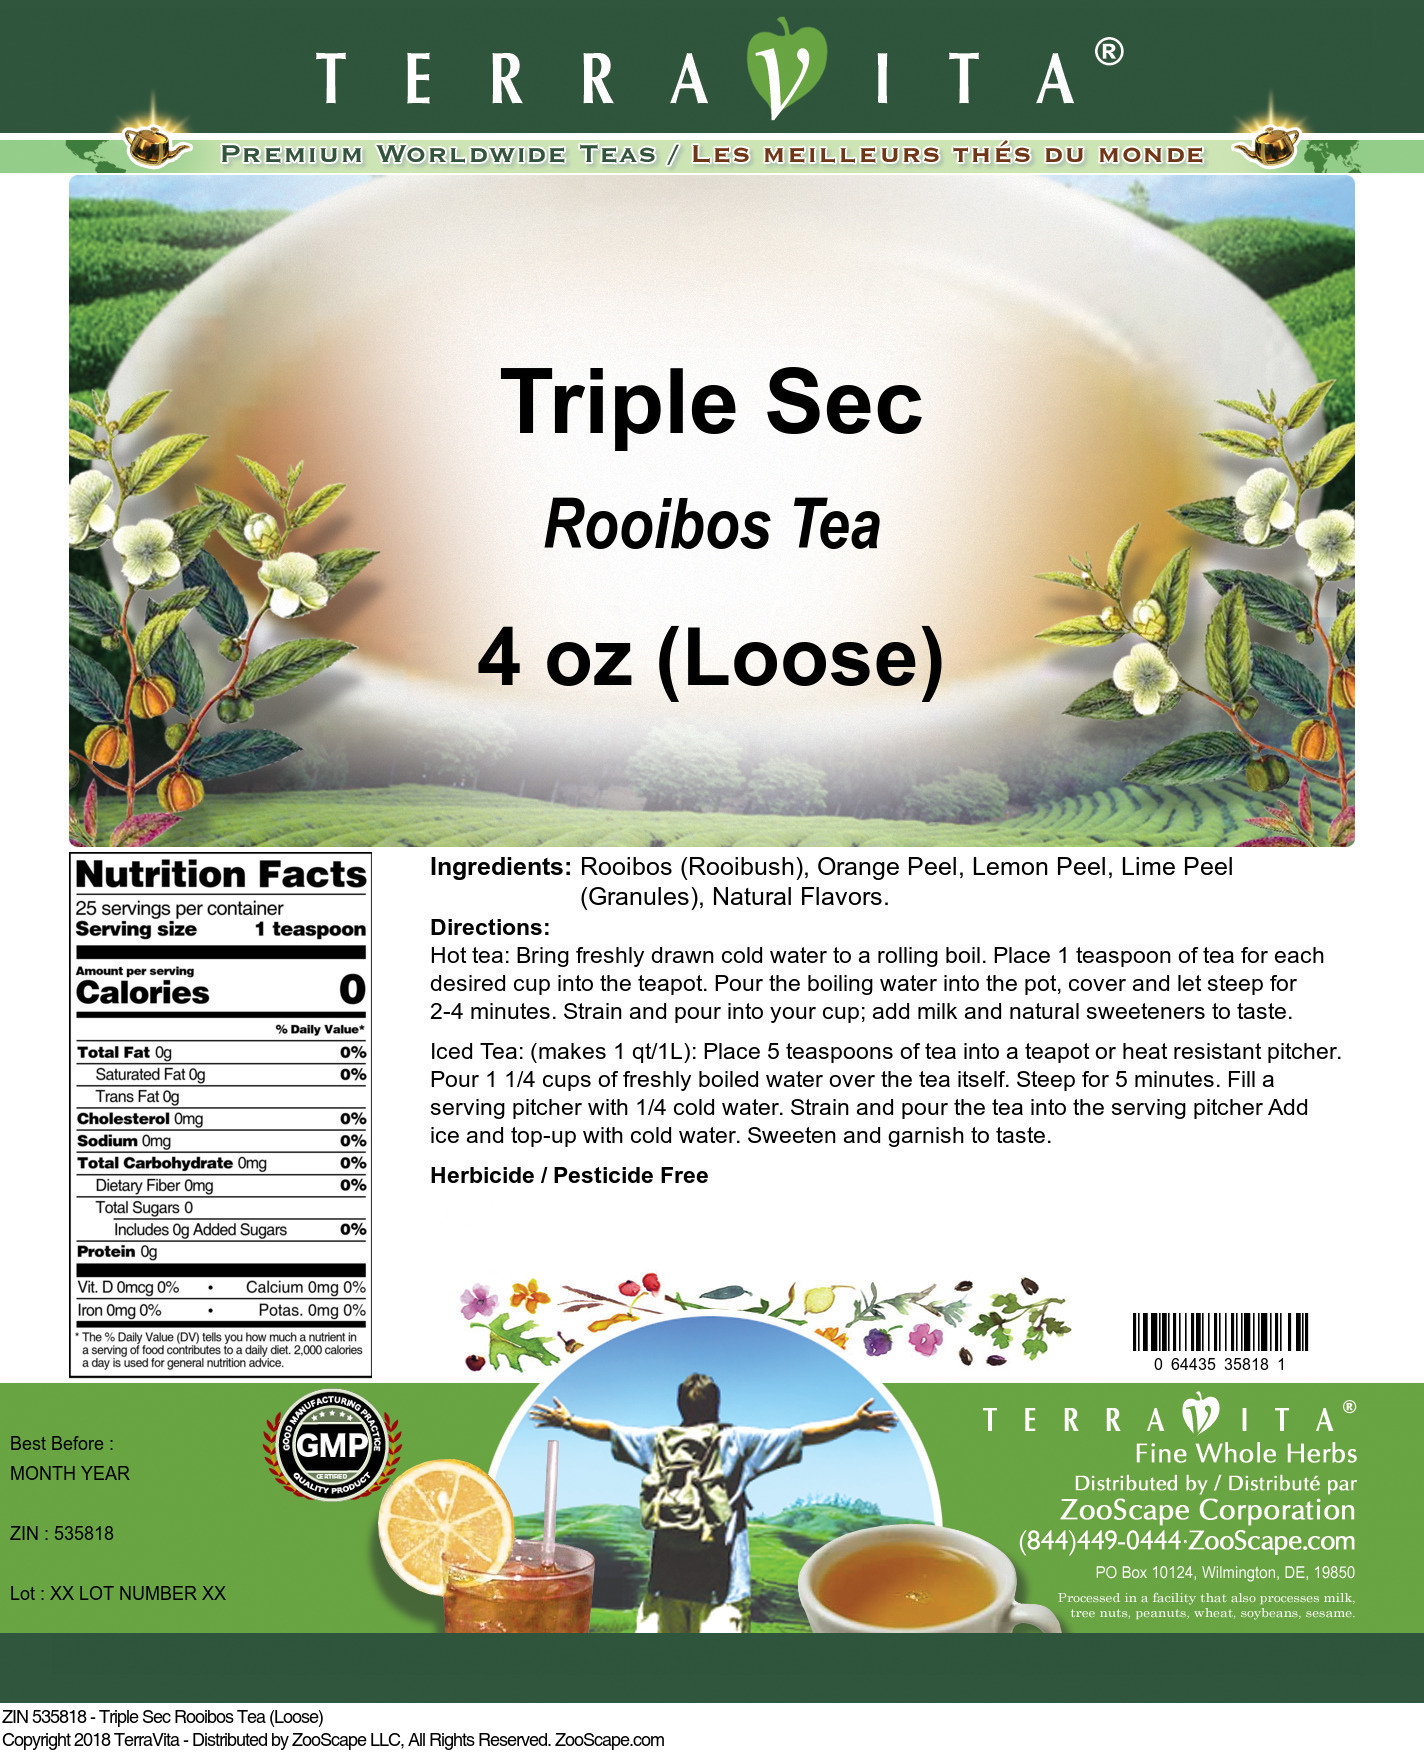 Triple Sec Rooibos Tea (Loose)